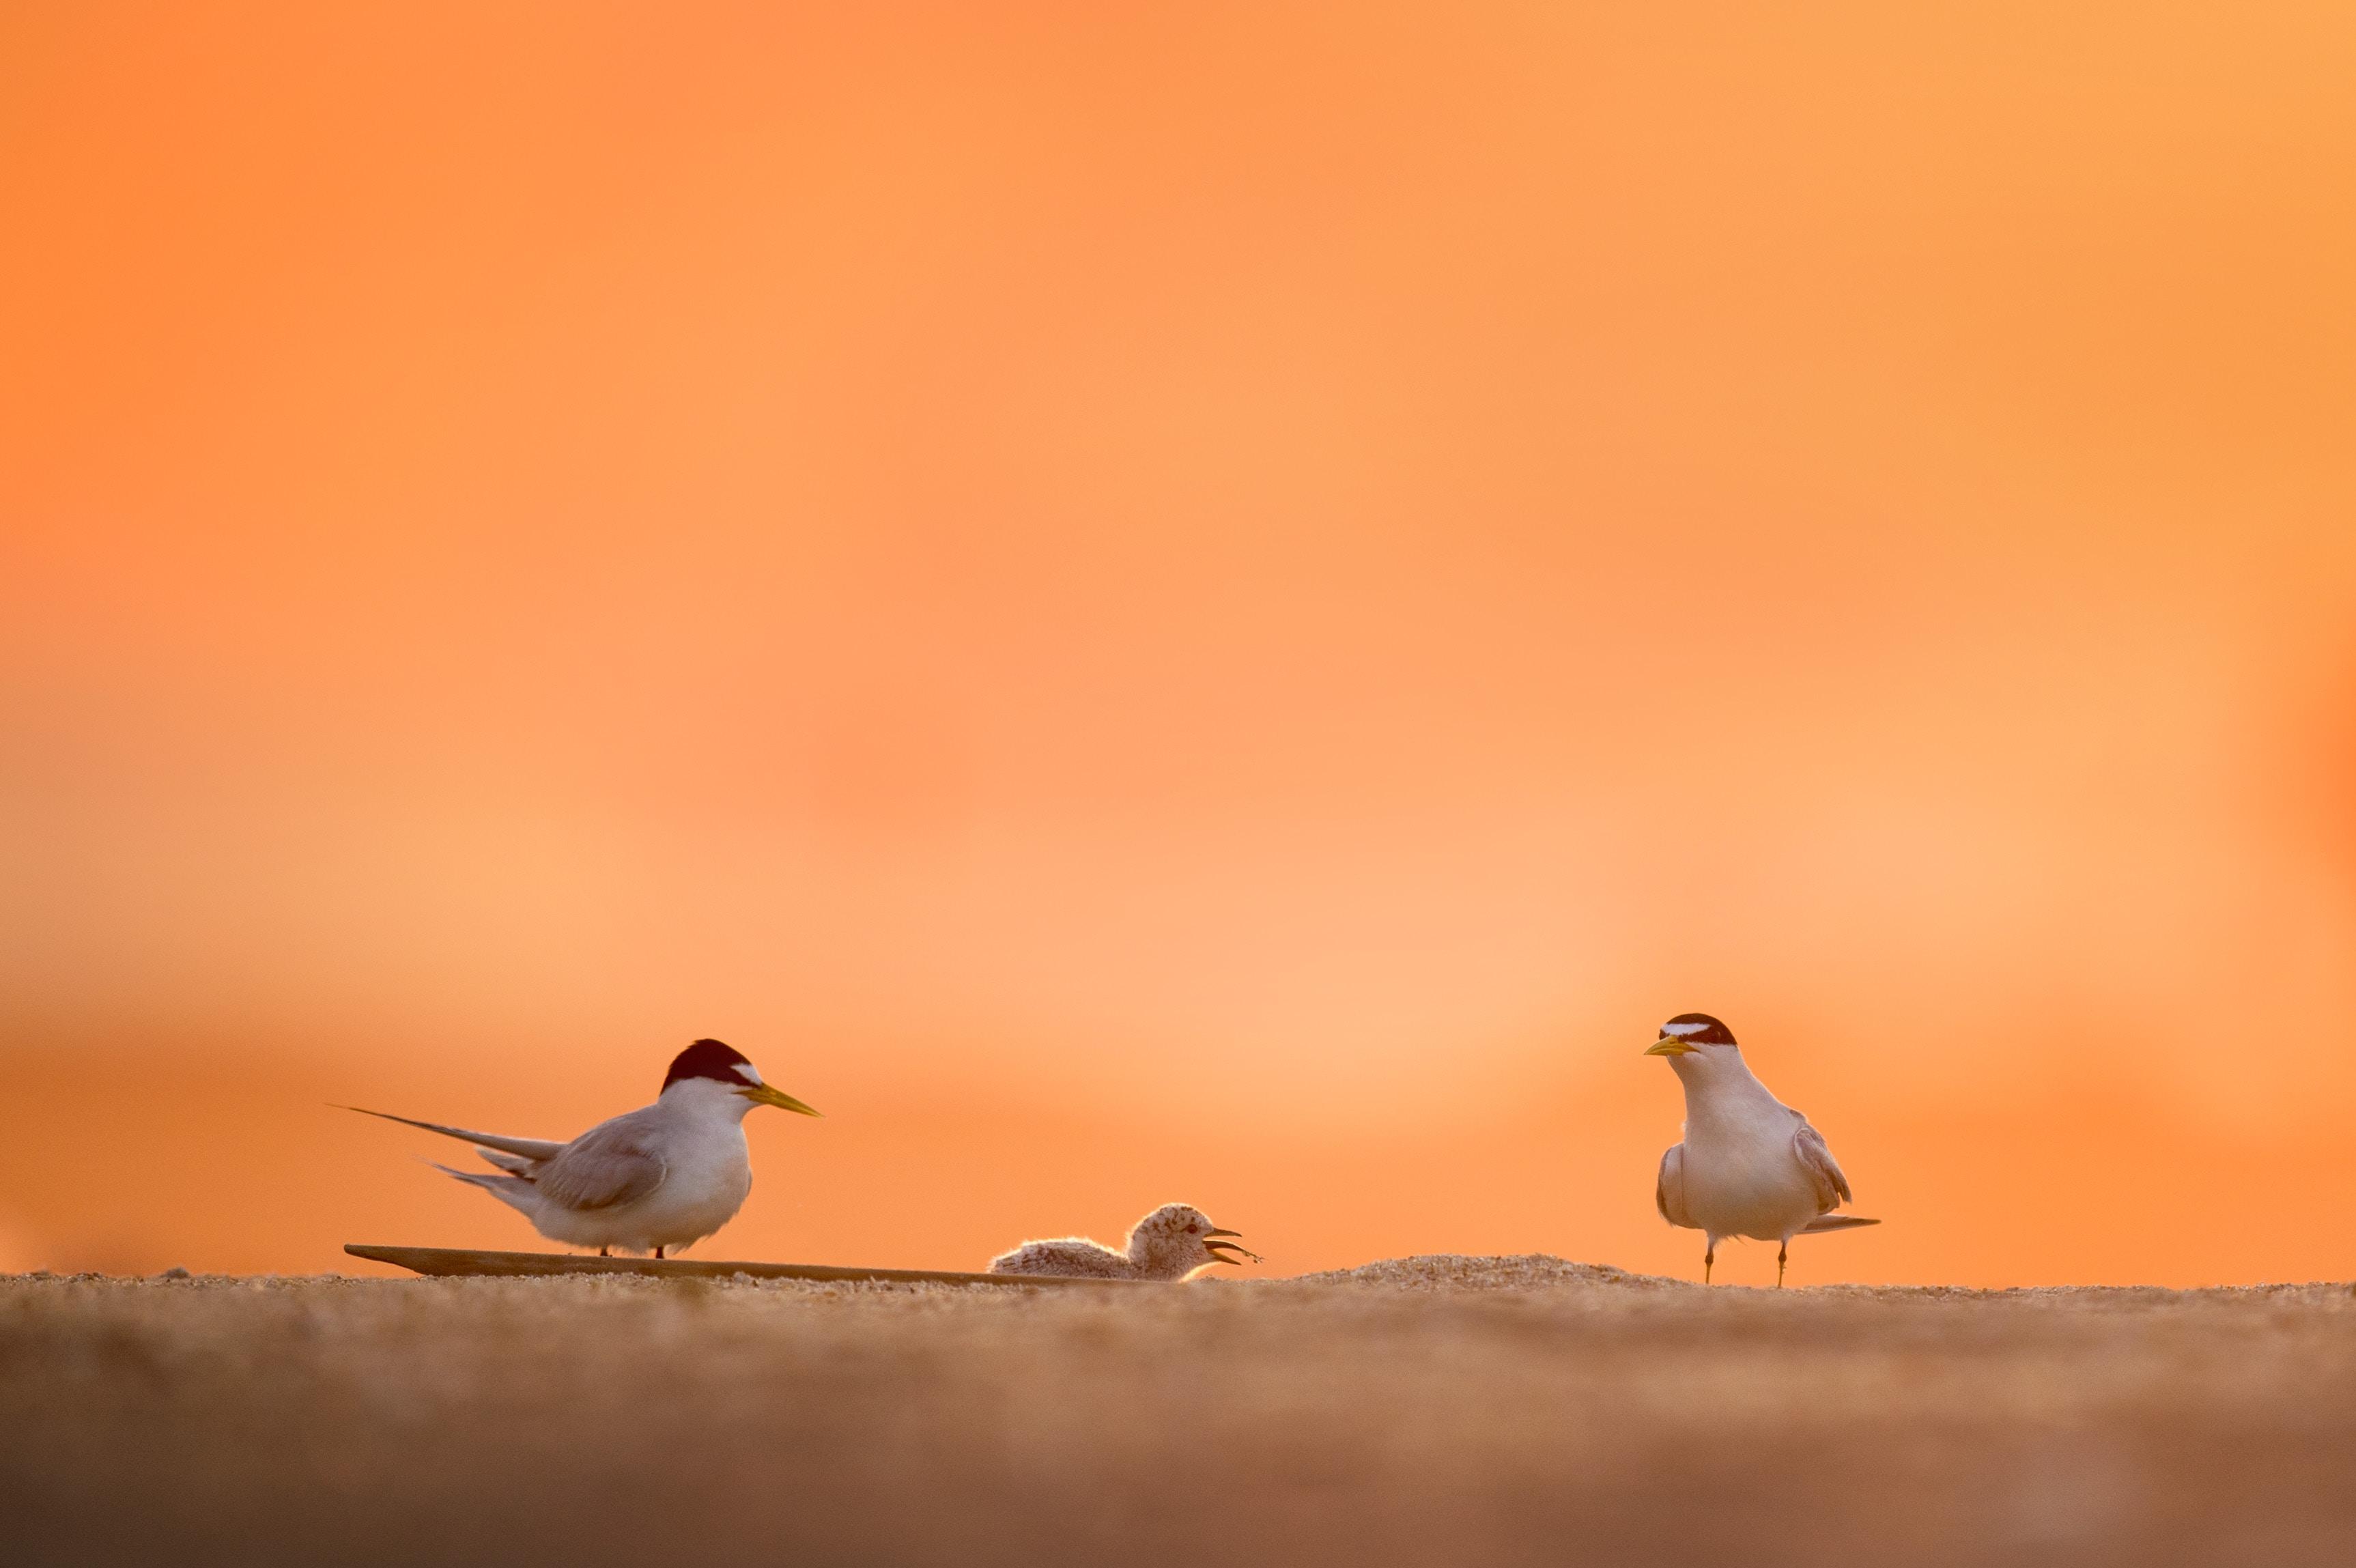 Two birds feeding a baby bird on sand beach during sunrise at Belmar